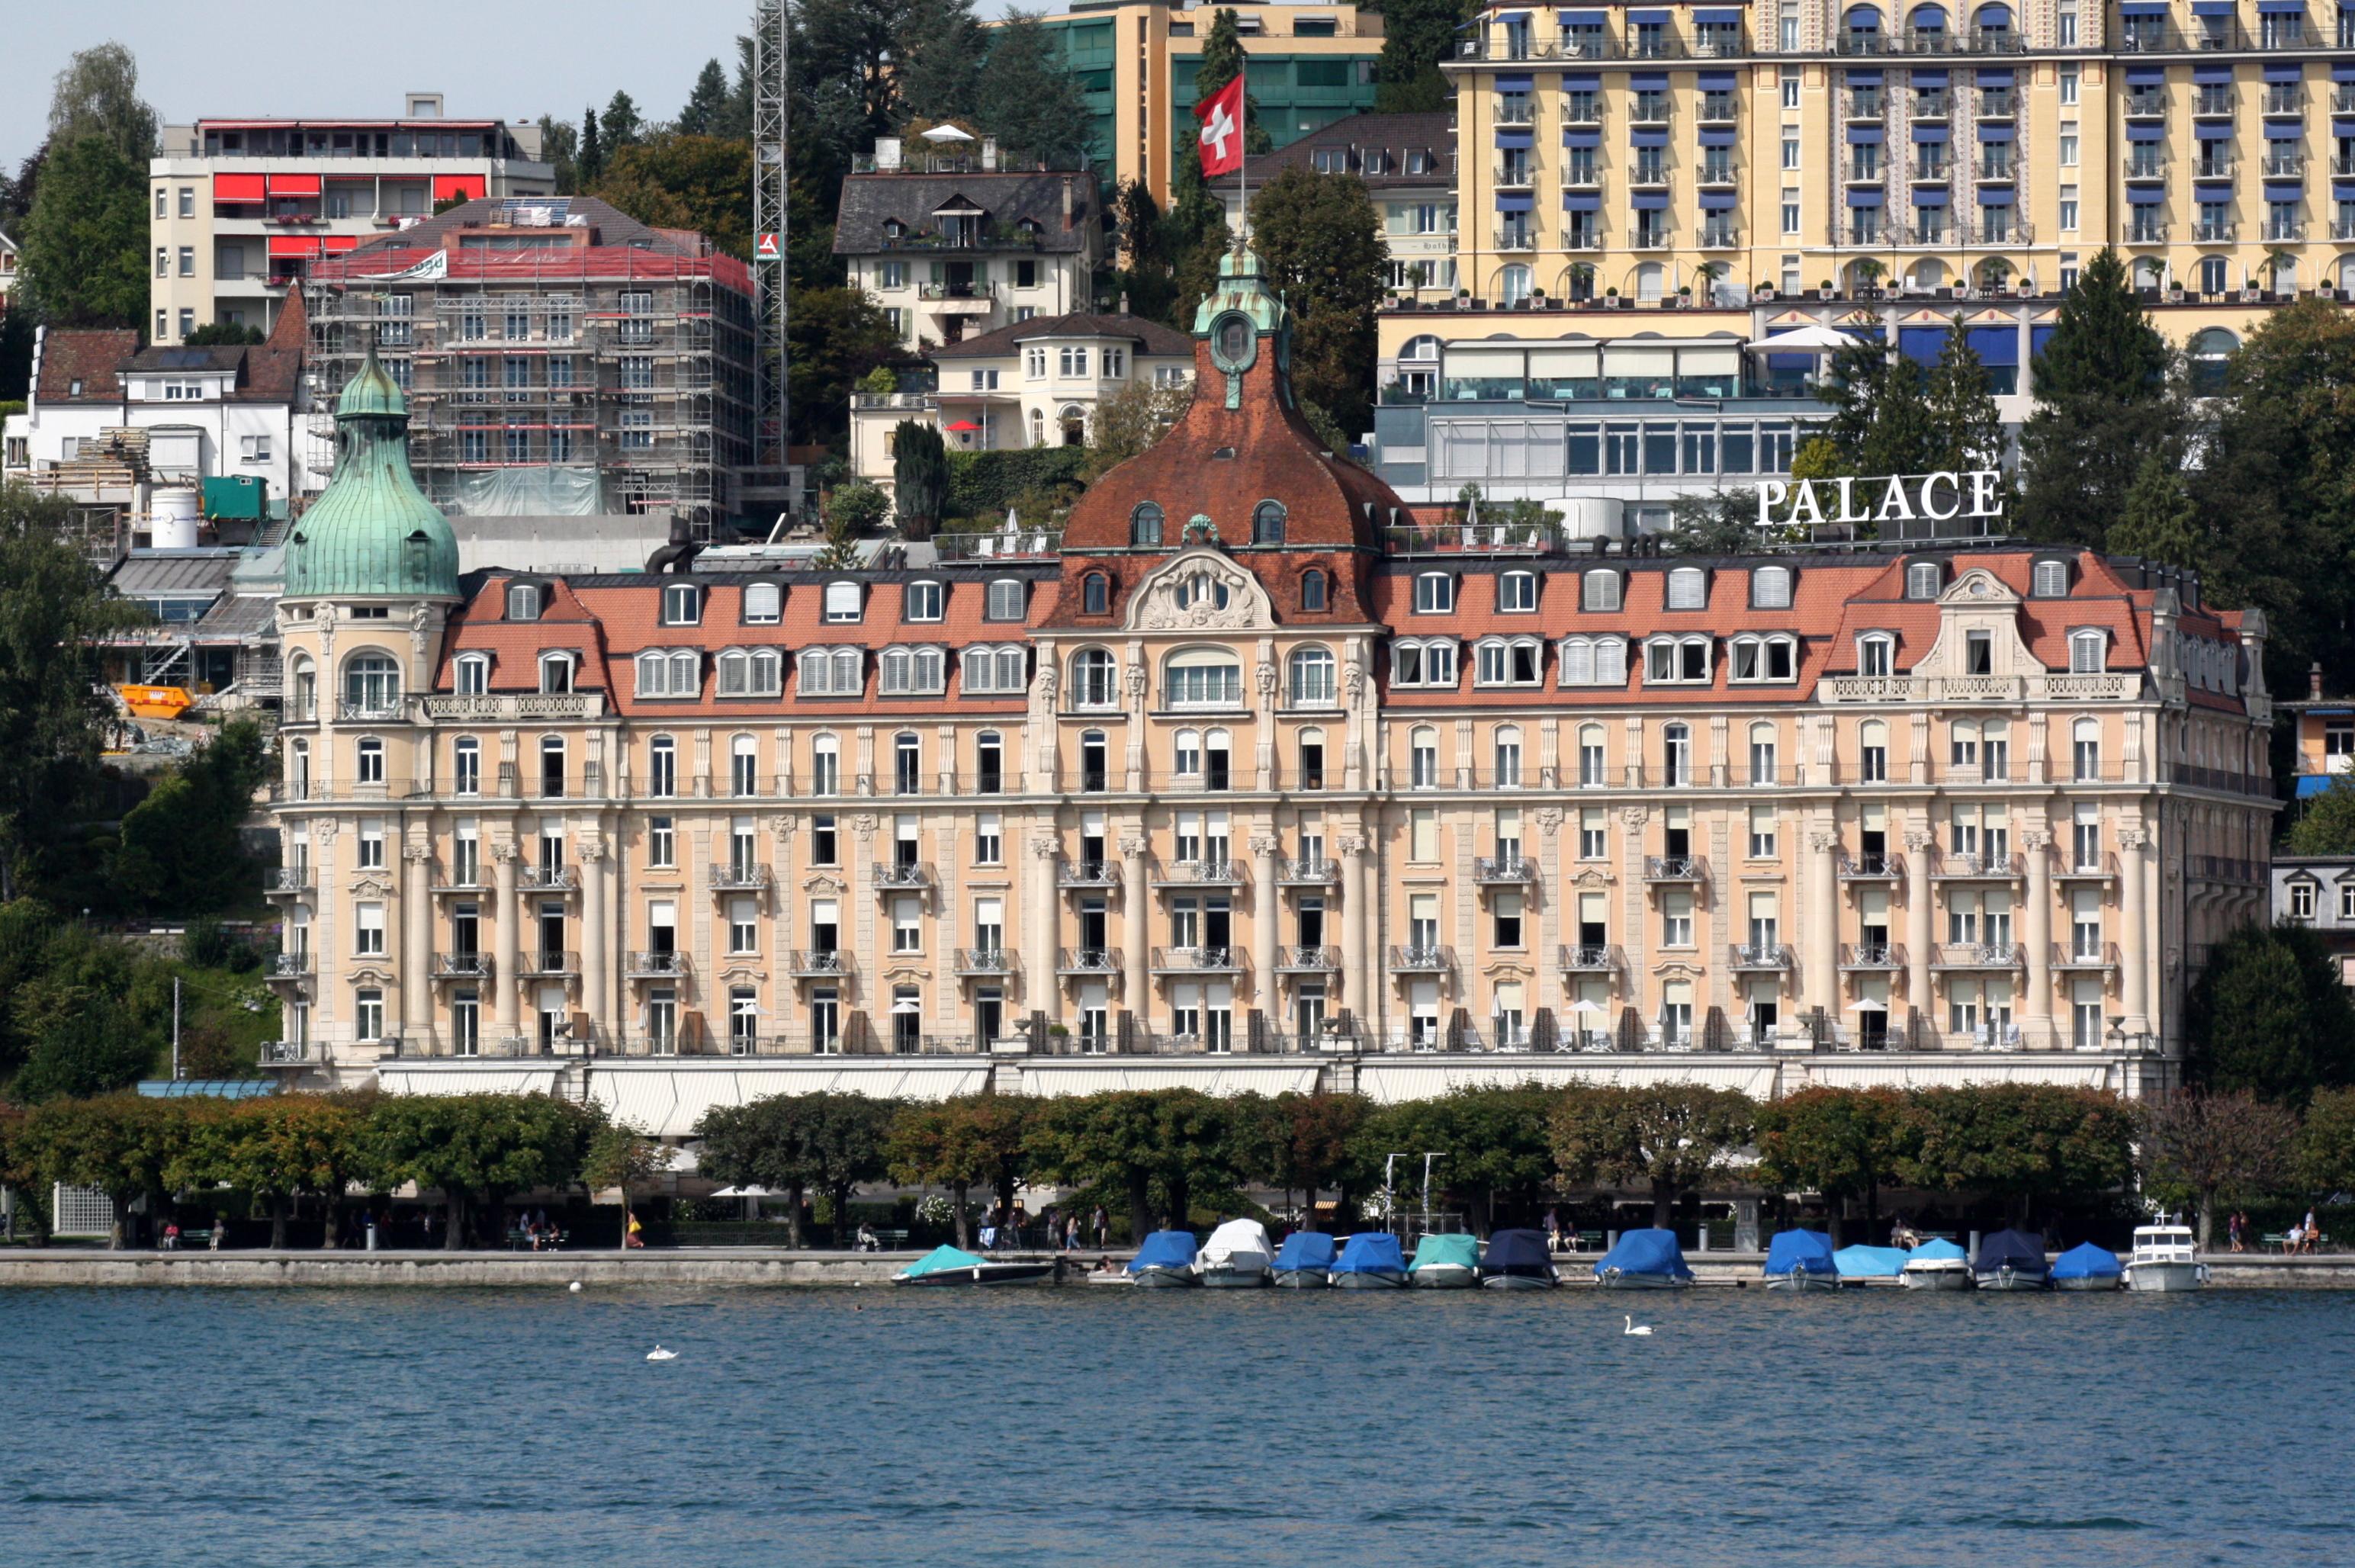 Palace Hotel Luzern Jobs